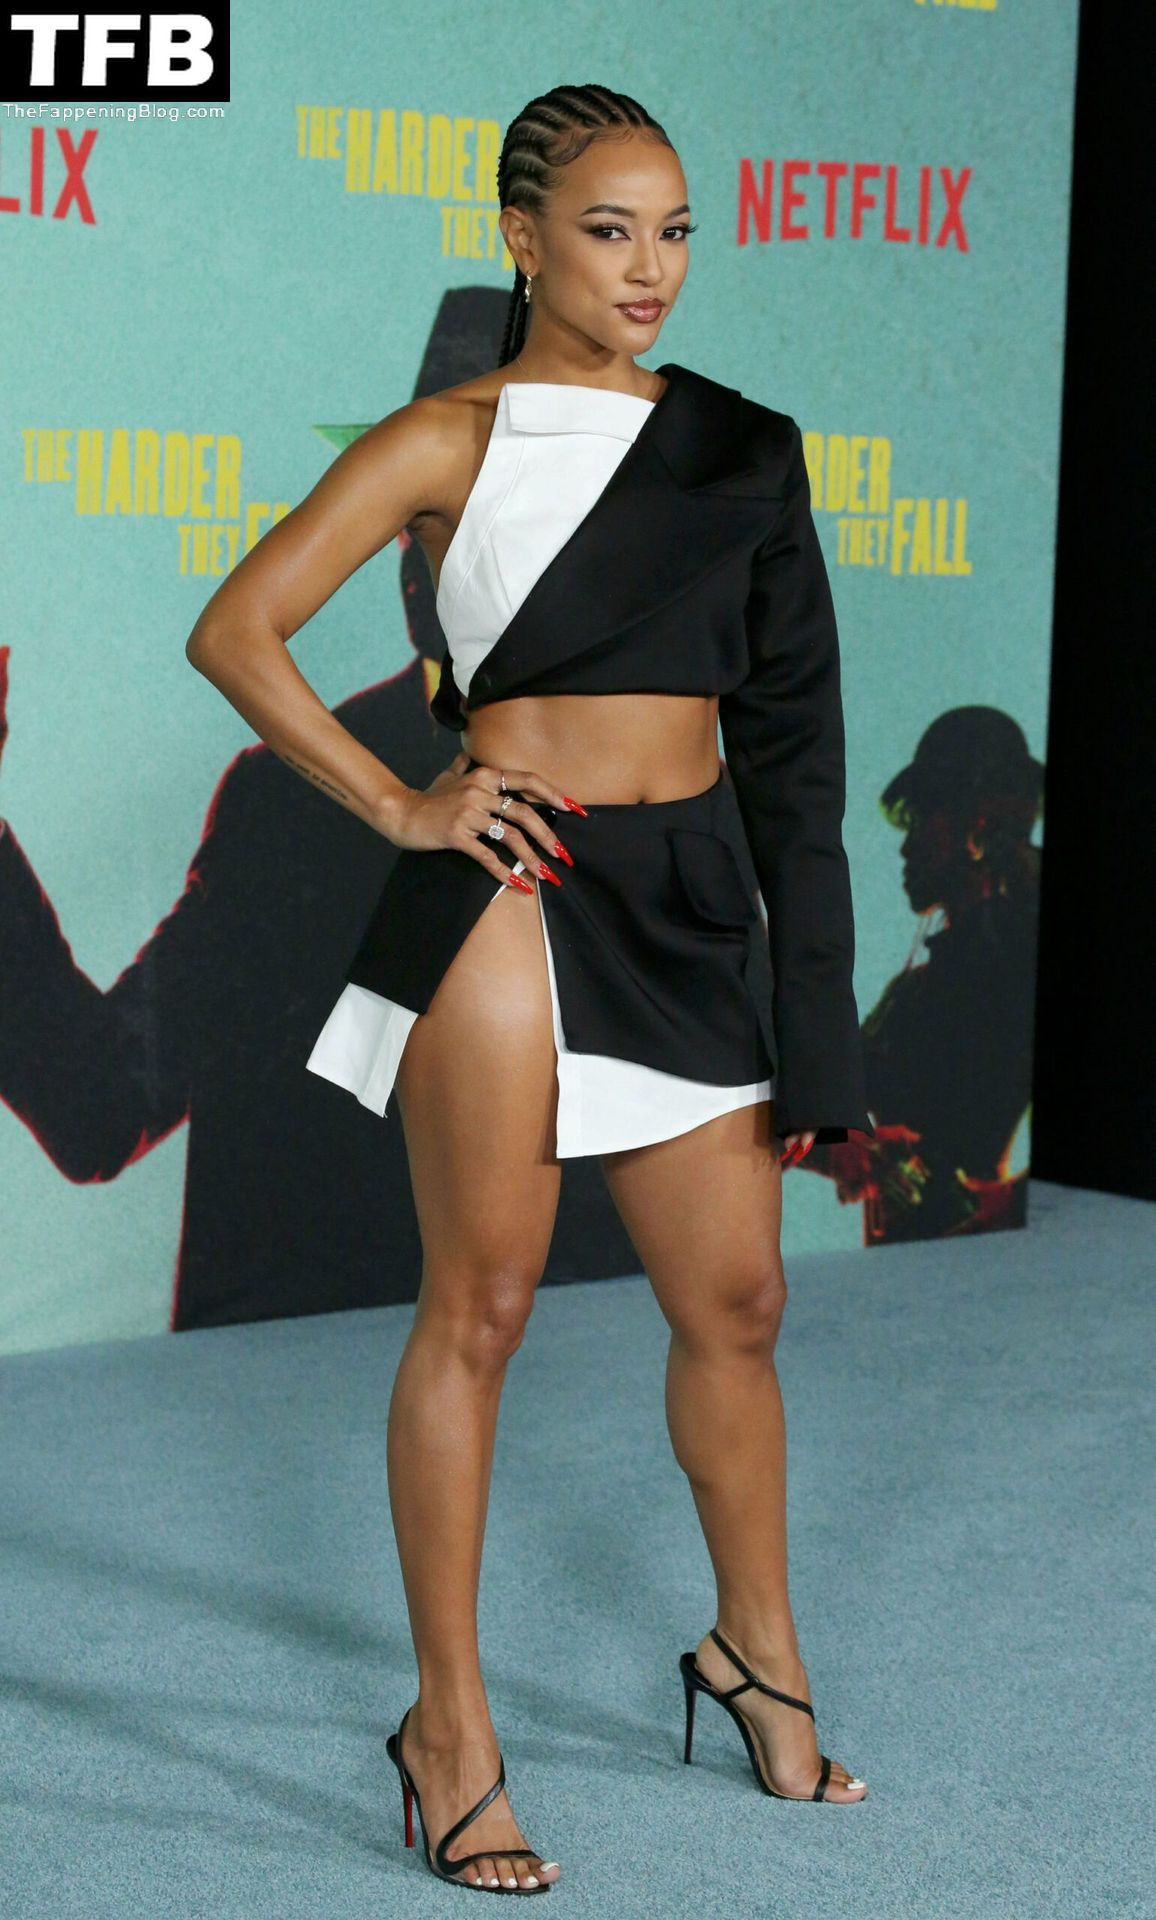 Karrueche-Tran-Sexy-Legs-Upskirt-The-Fappening-Blog-15.jpg